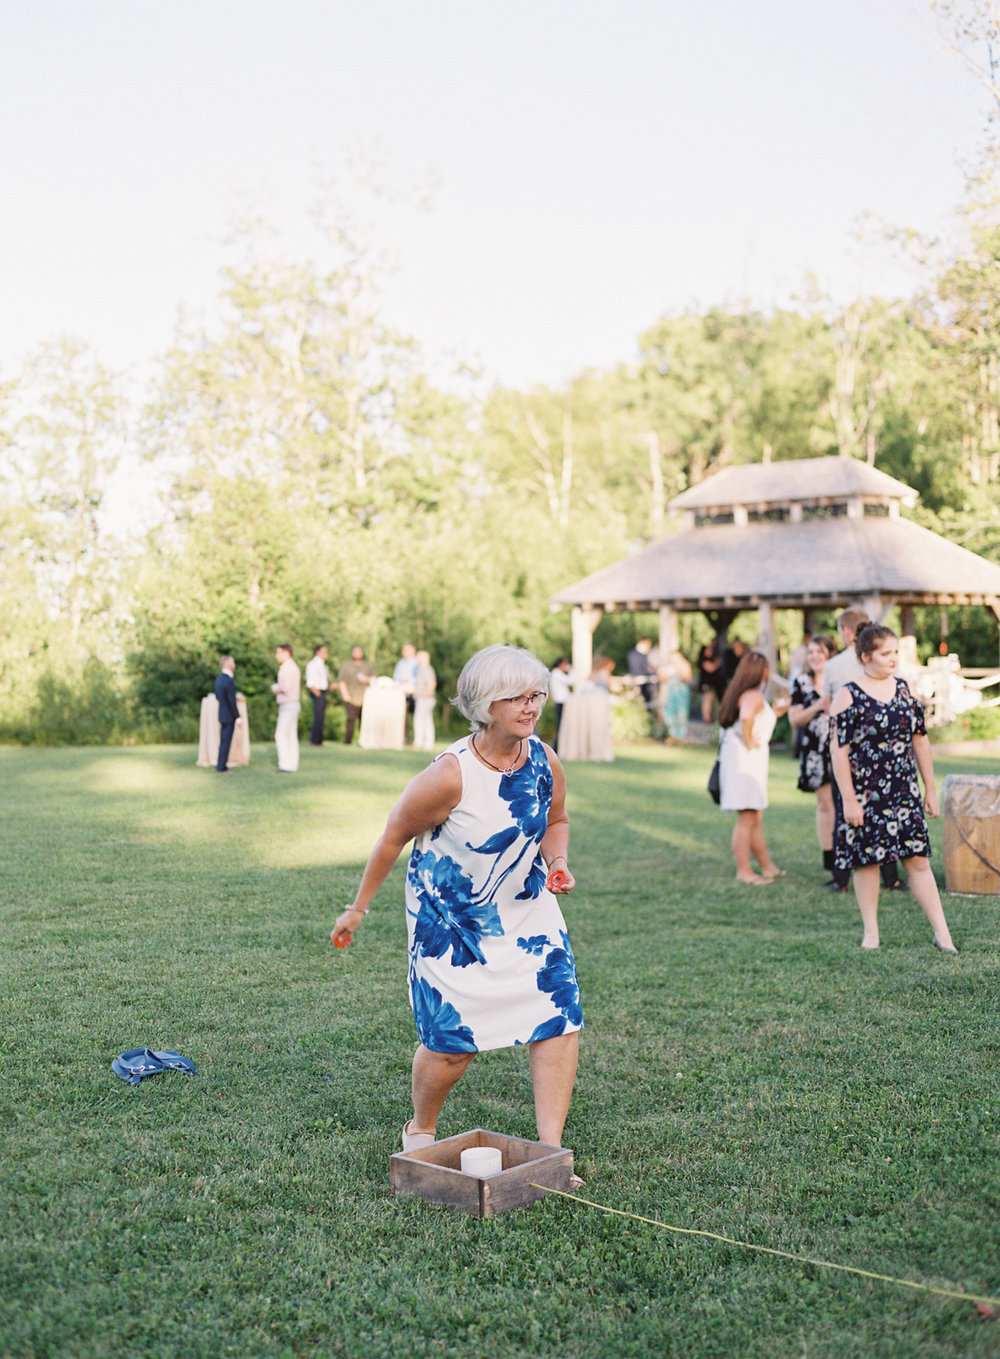 Jacqueline Anne Photography - Nova Scotia Backyard Wedding-62.jpg